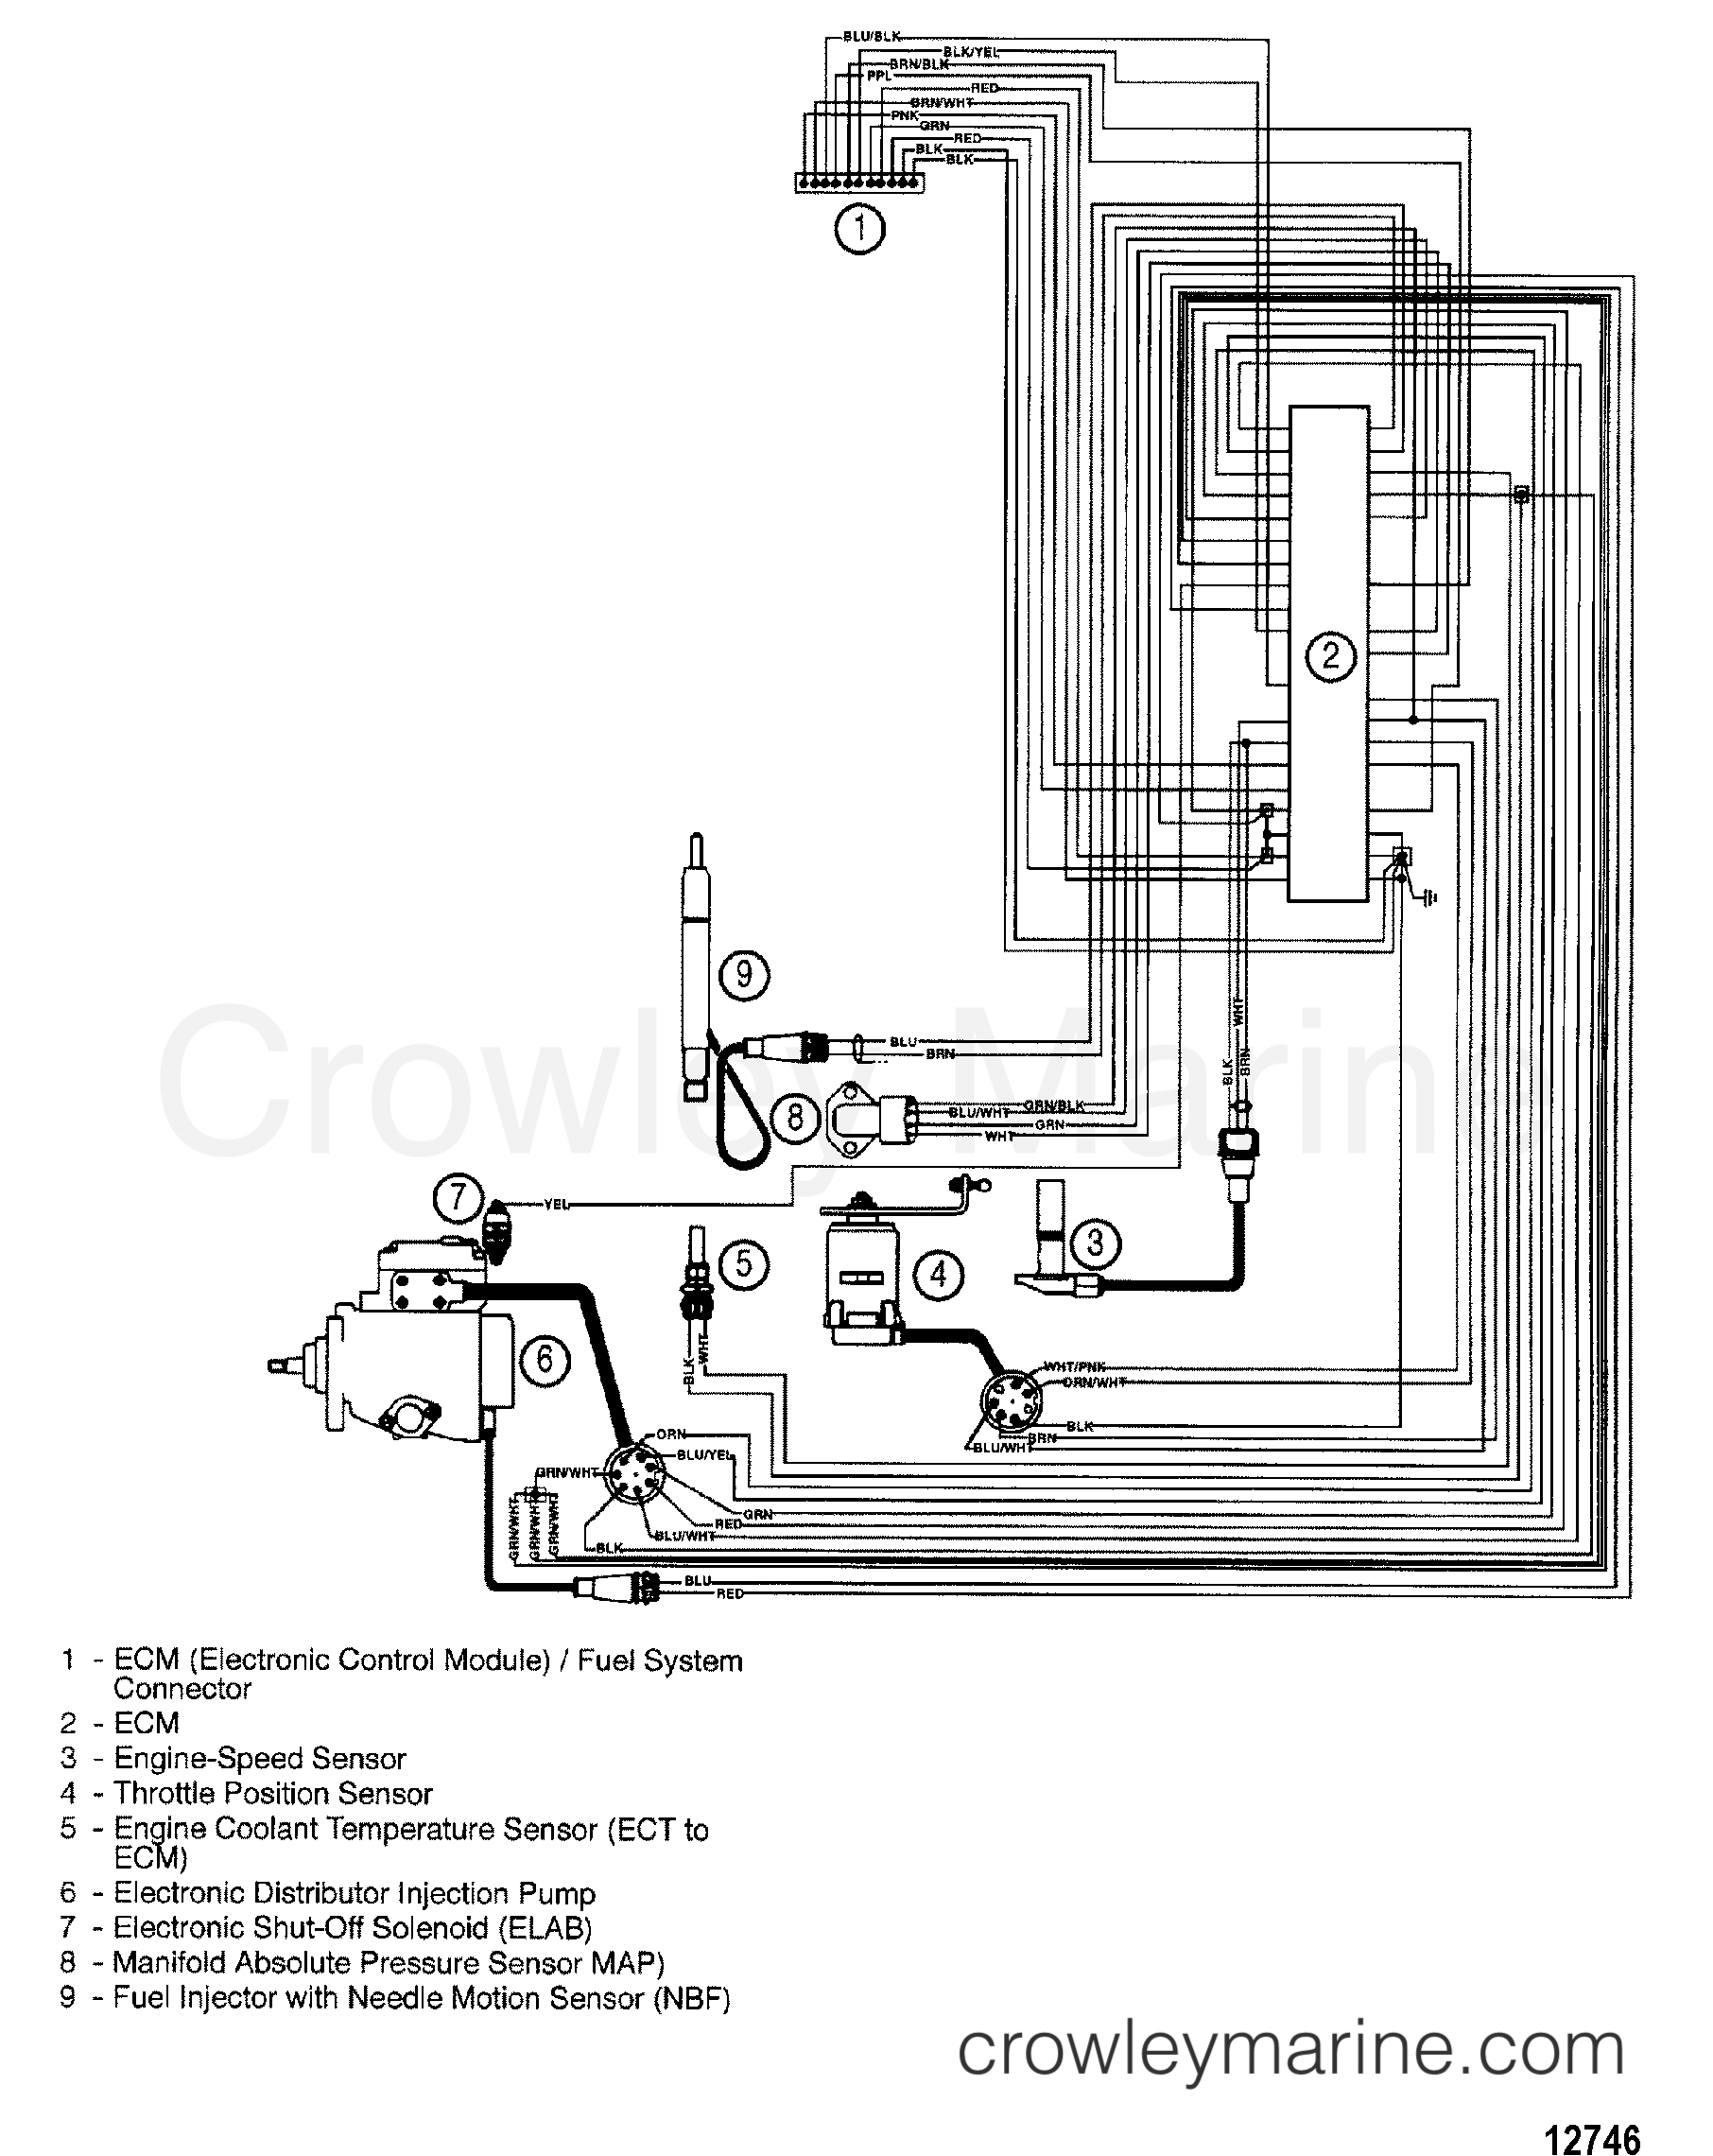 EDI HARNESS - 1997 Mercruiser 2 8LD [D-TRONIC] 428B116KD | Crowley